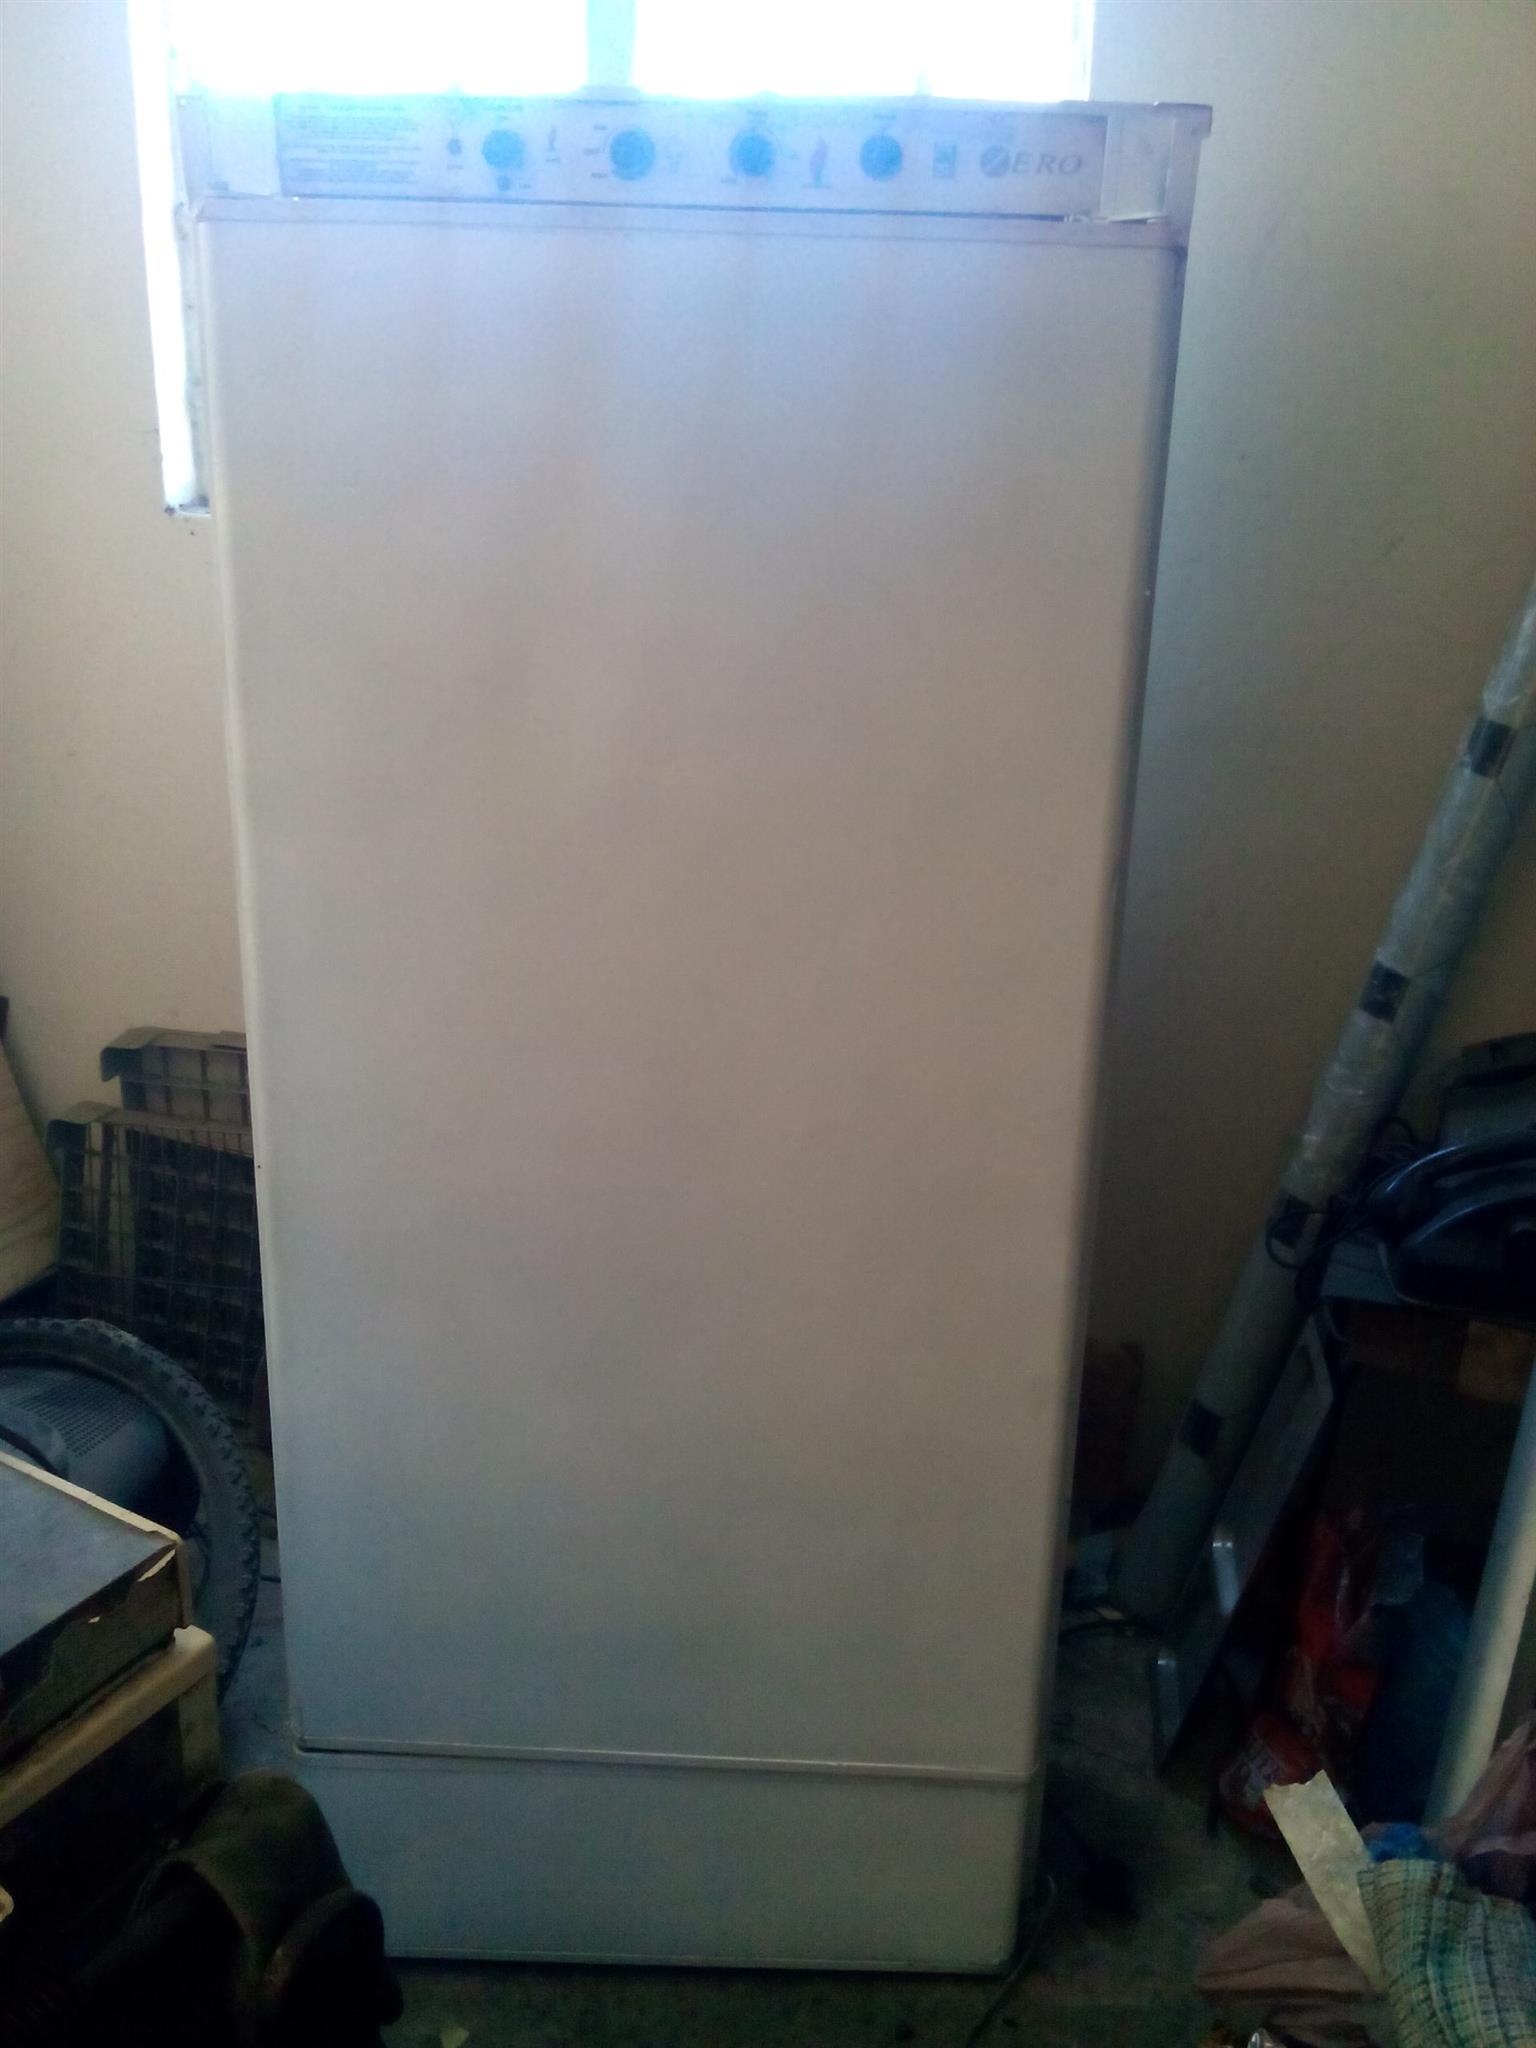 Zero gas & electric fridge